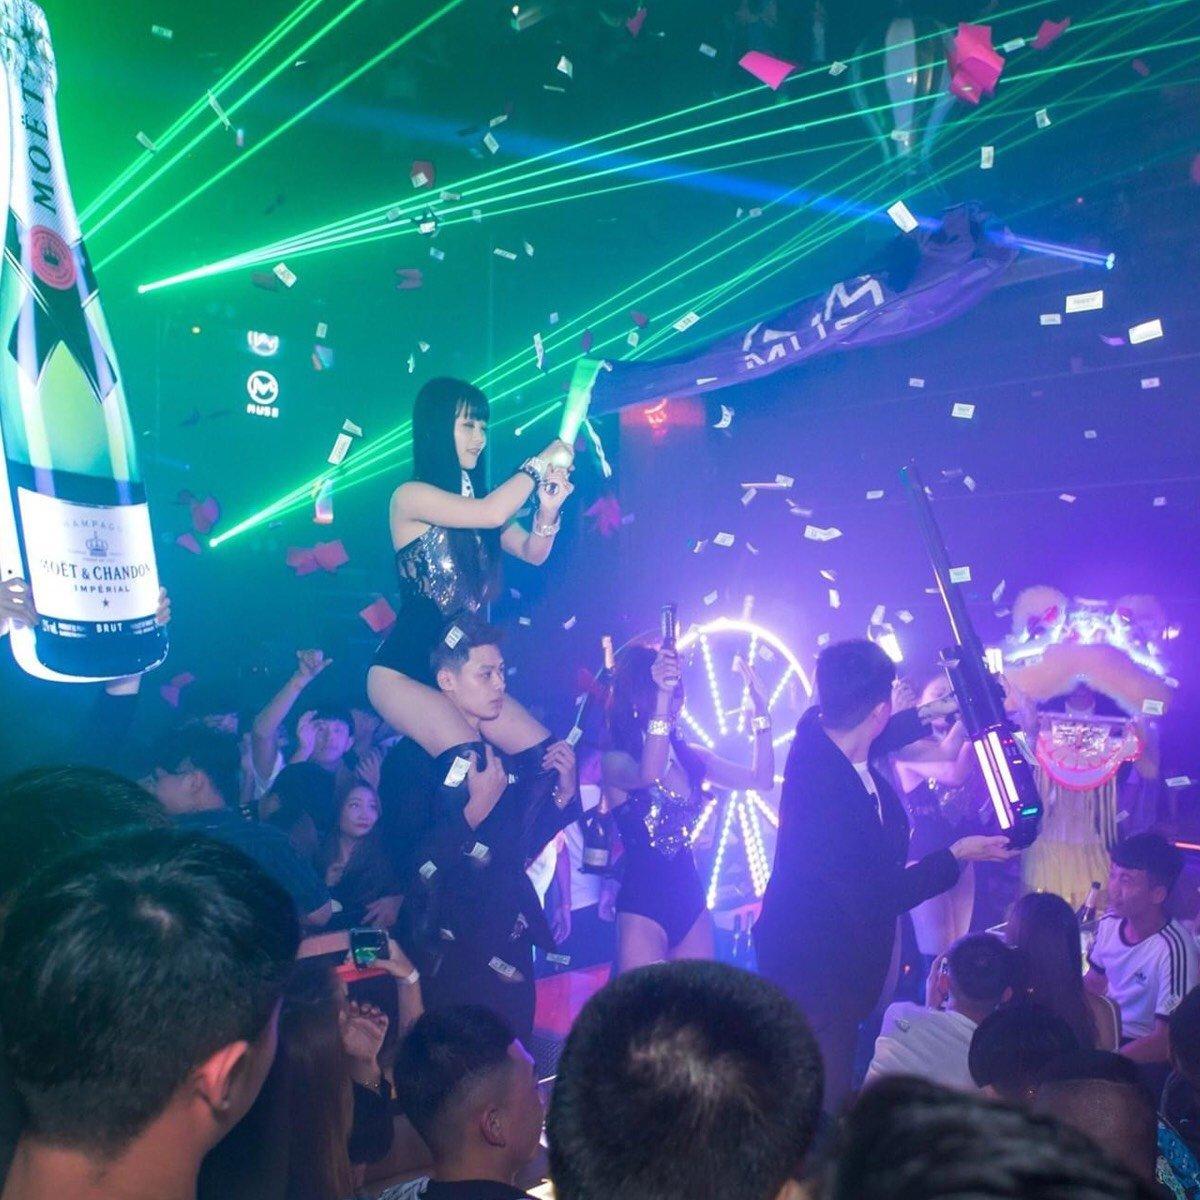 bear and nightclub